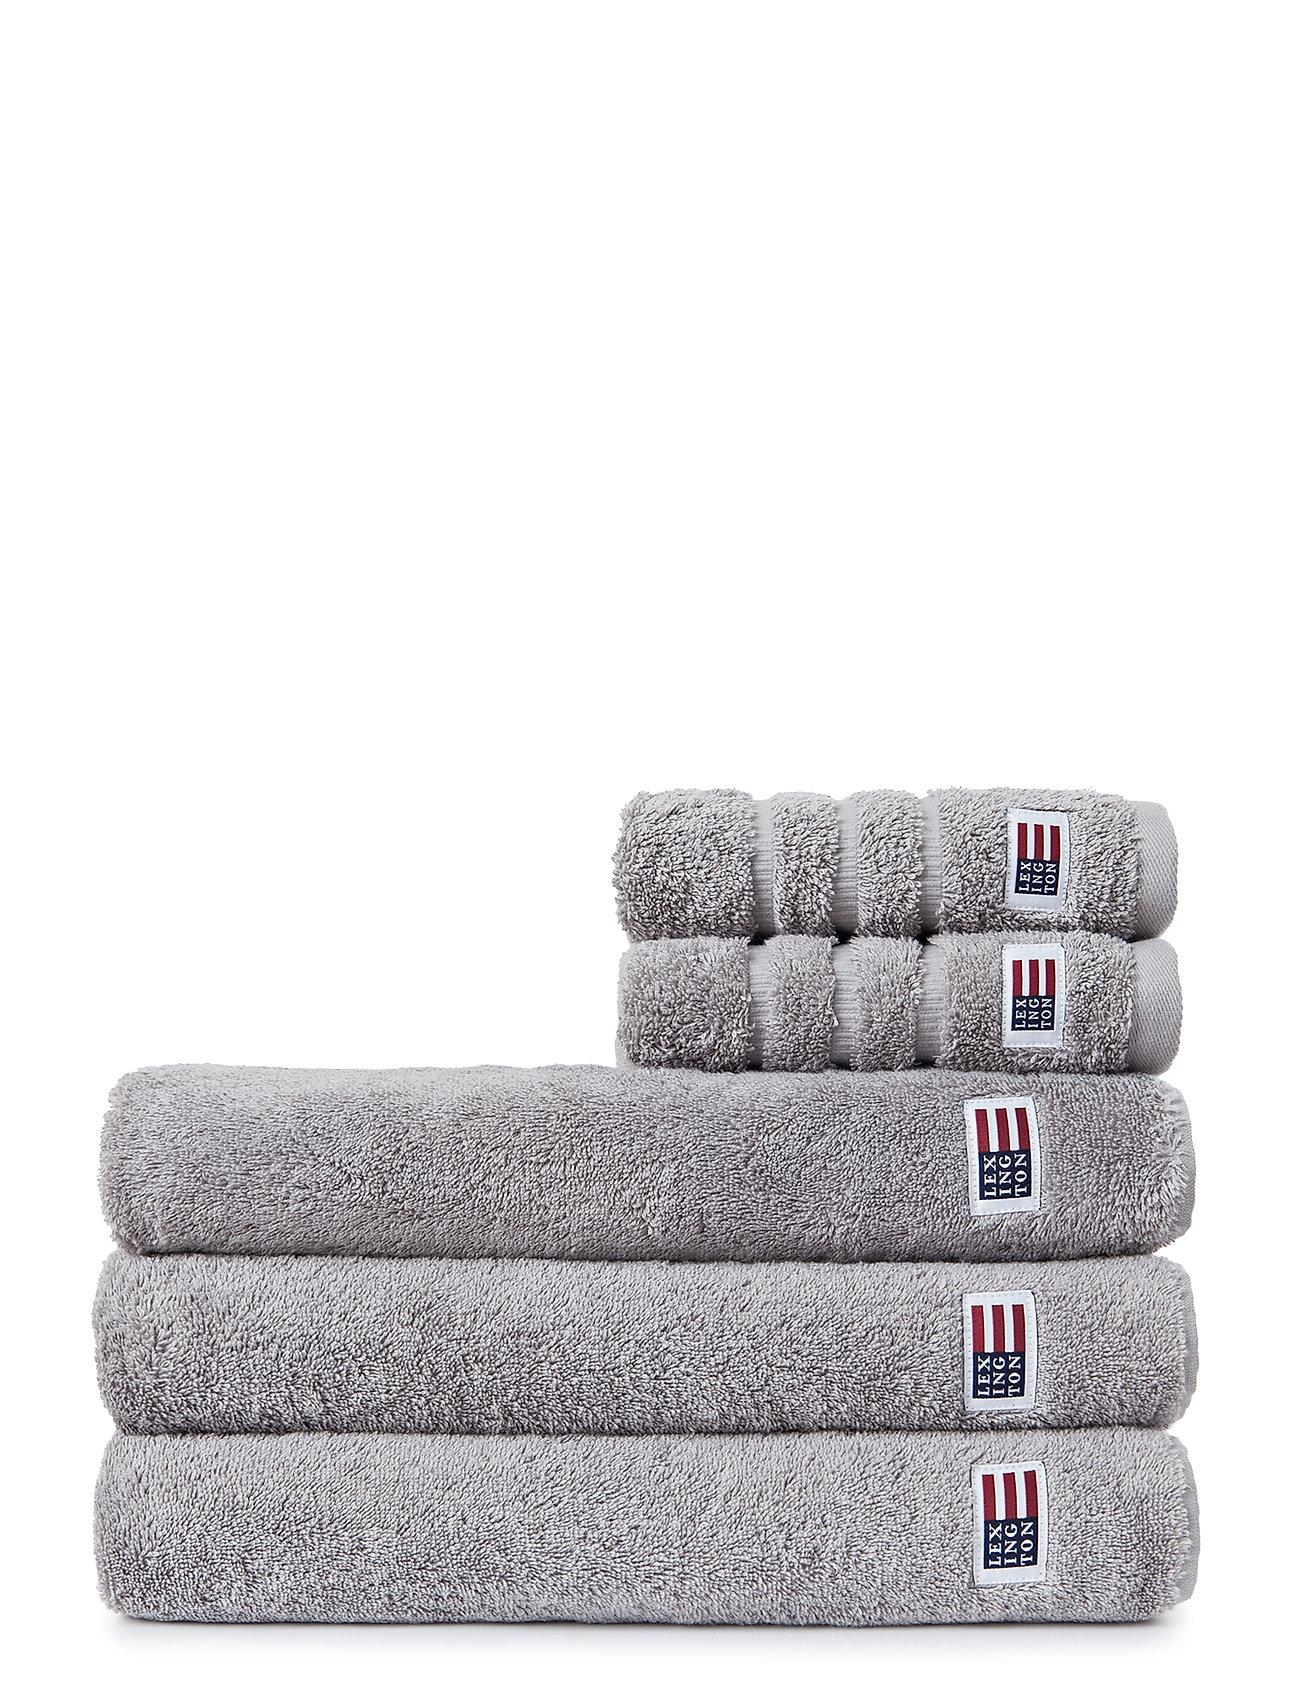 Lexington Home Original Towel Dark Gray - DK. GRAY